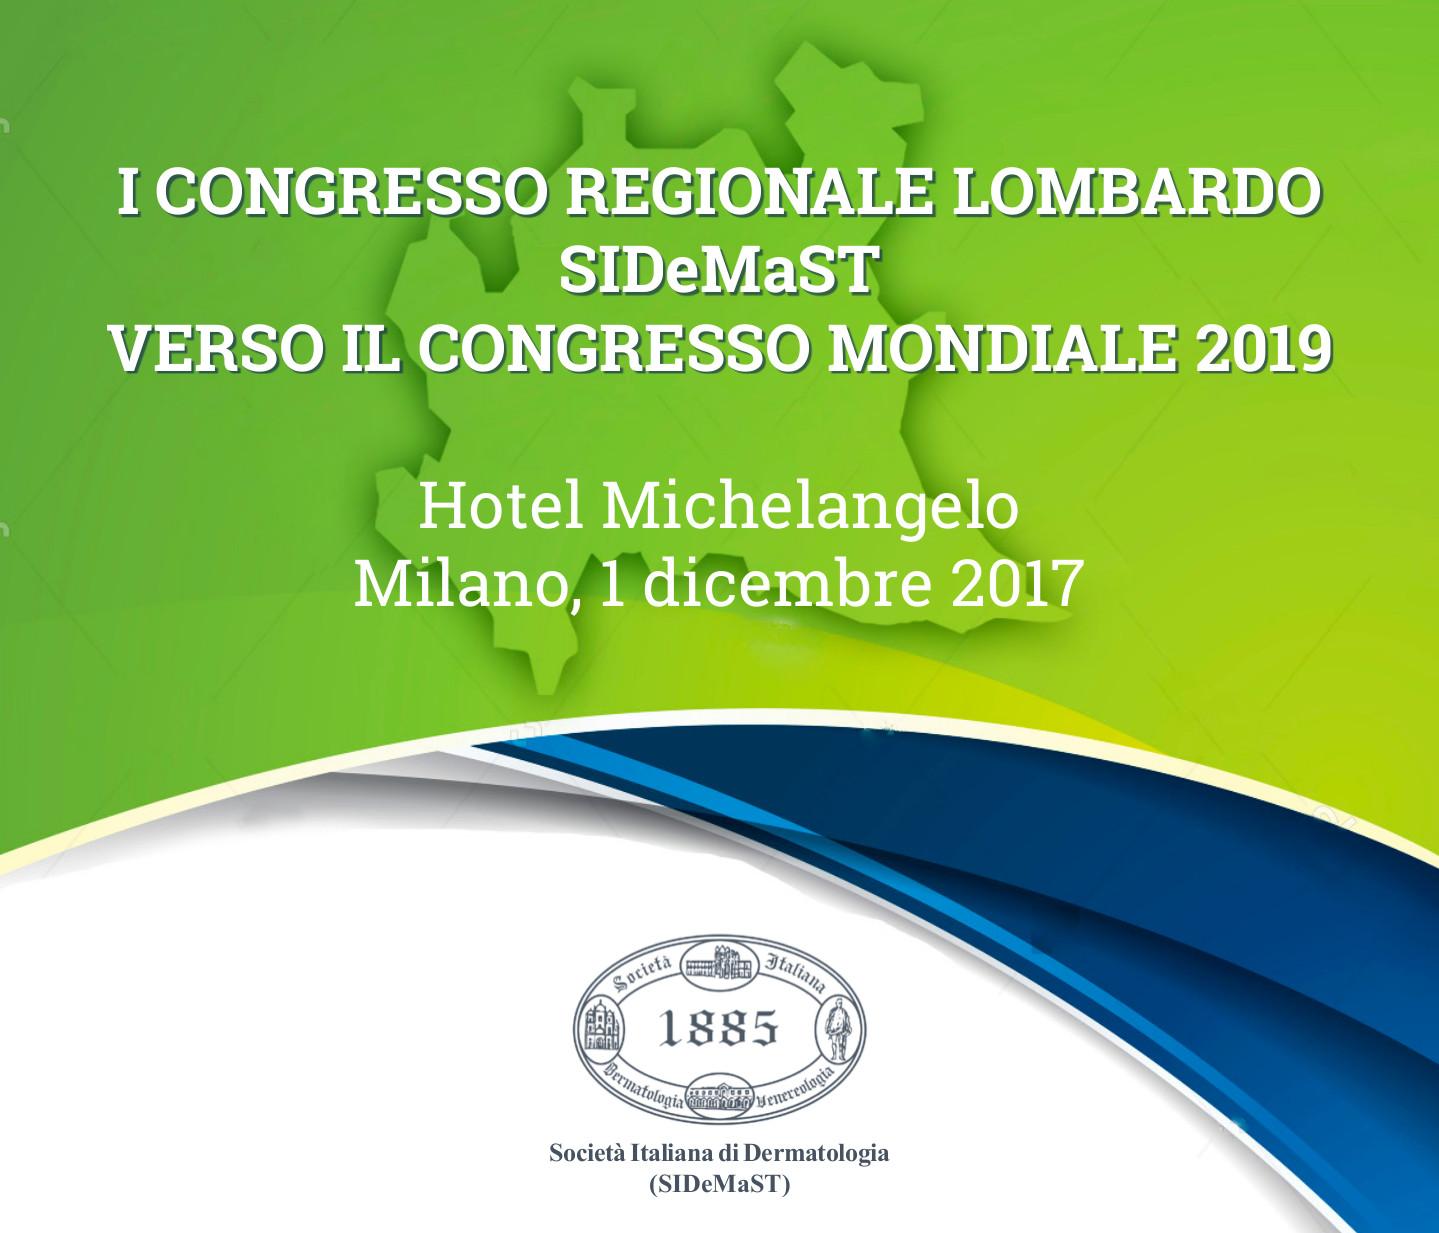 I Congresso Regionale Lombardo SIDeMaST